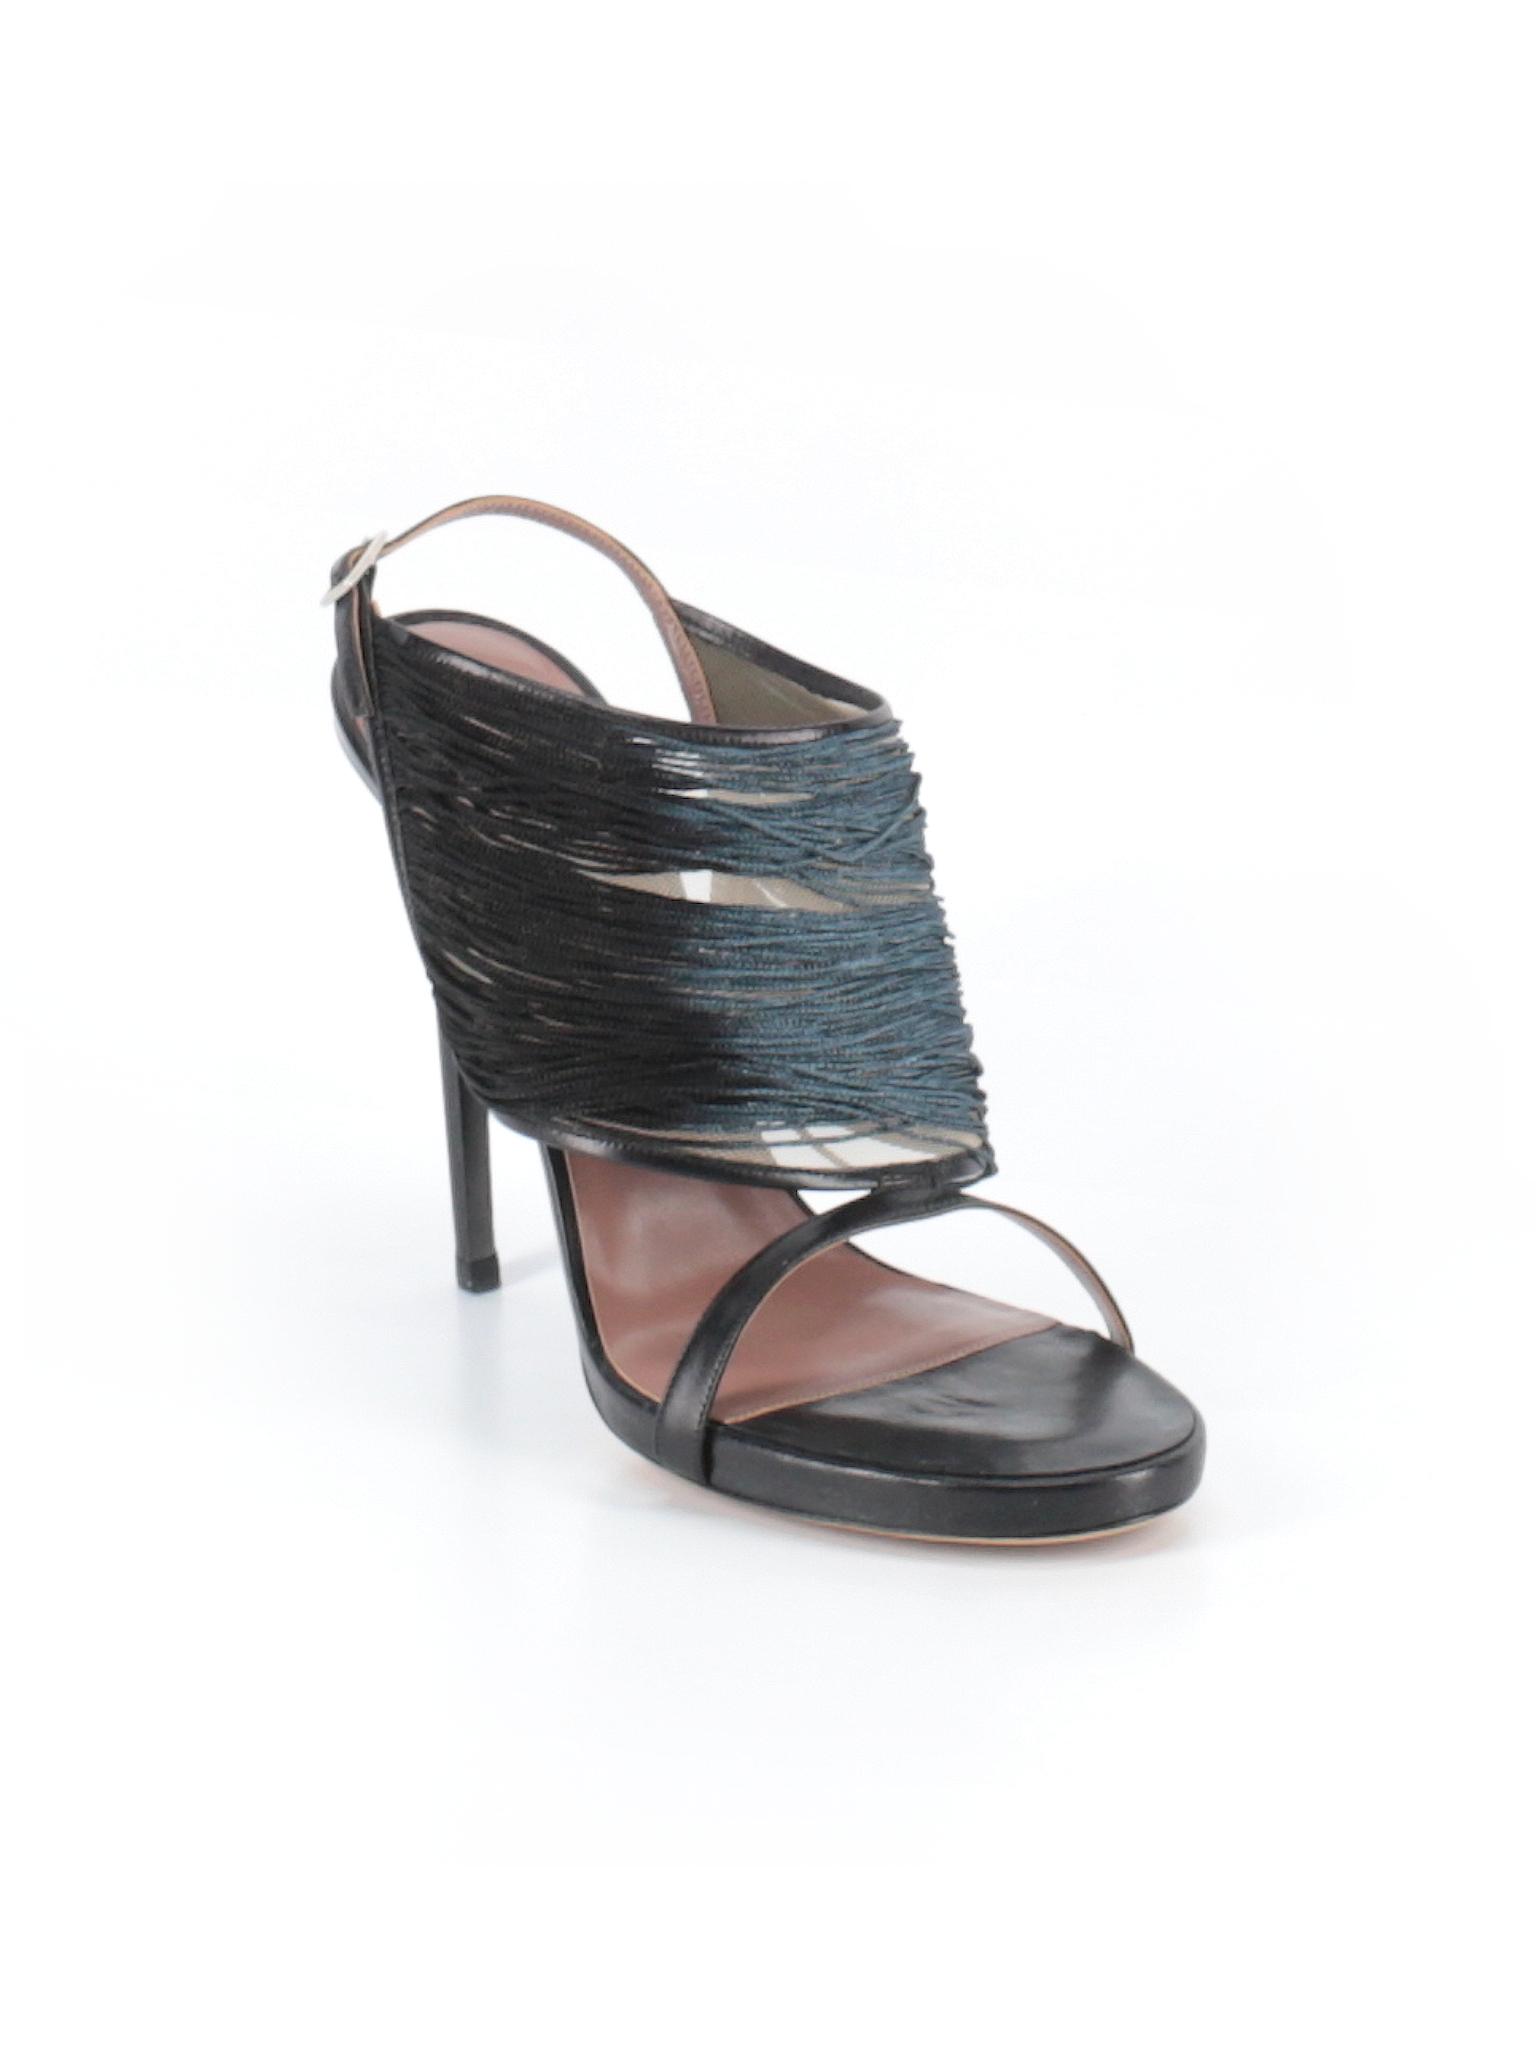 Boutique promotion Boutique Heels Tabitha Tabitha Simmons promotion dHfH8vq